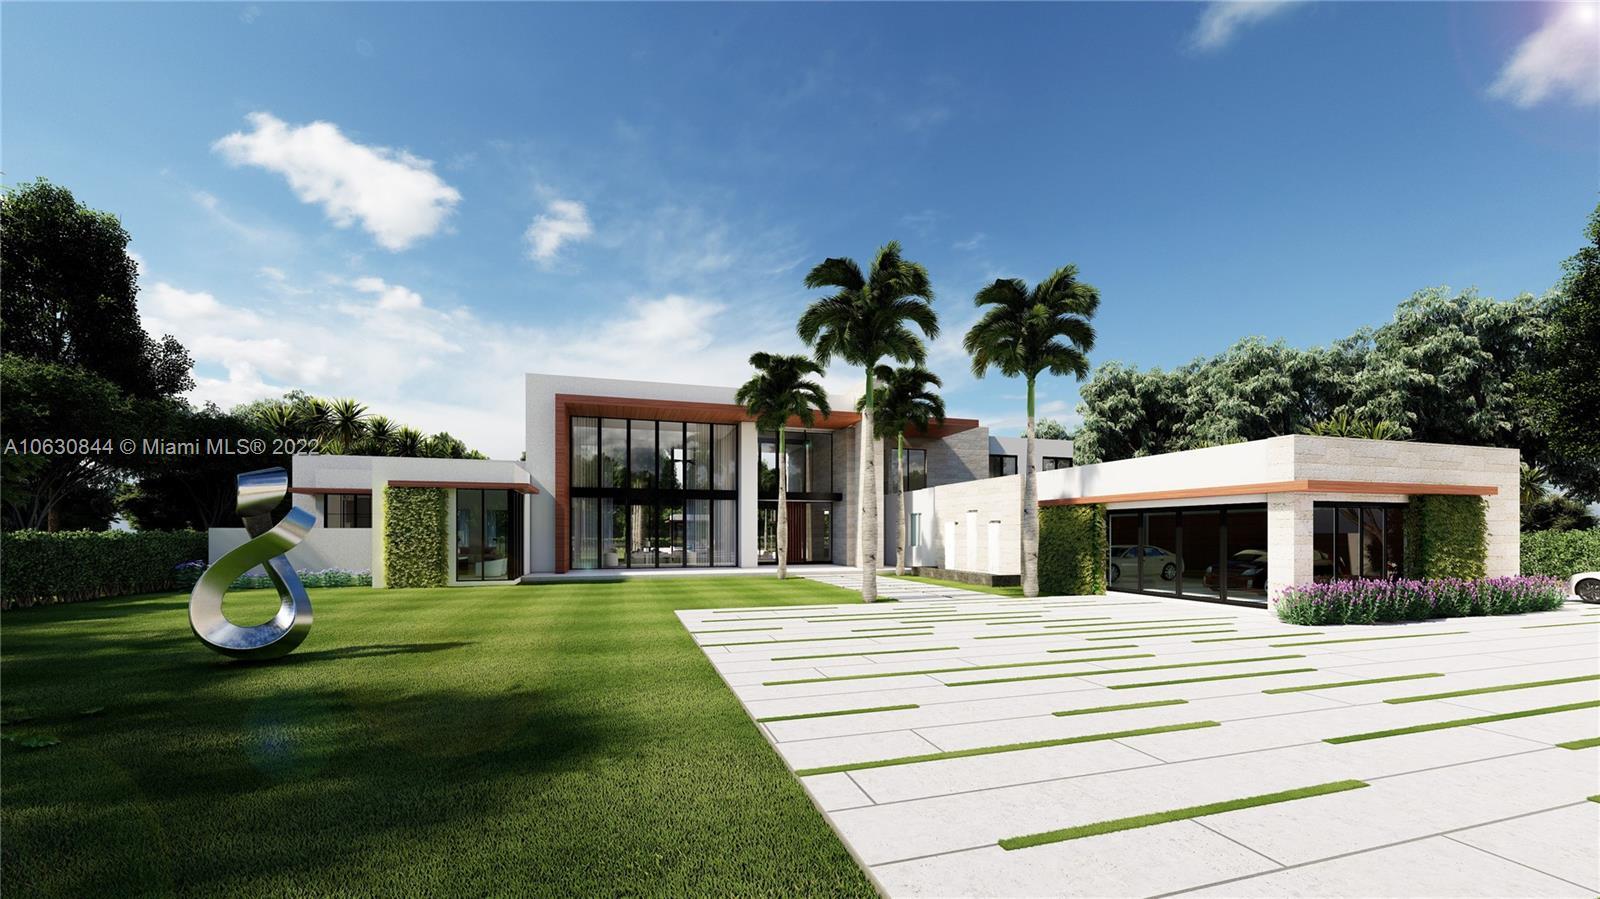 16825 Stratford Ct, Southwest Ranches, FL 33331